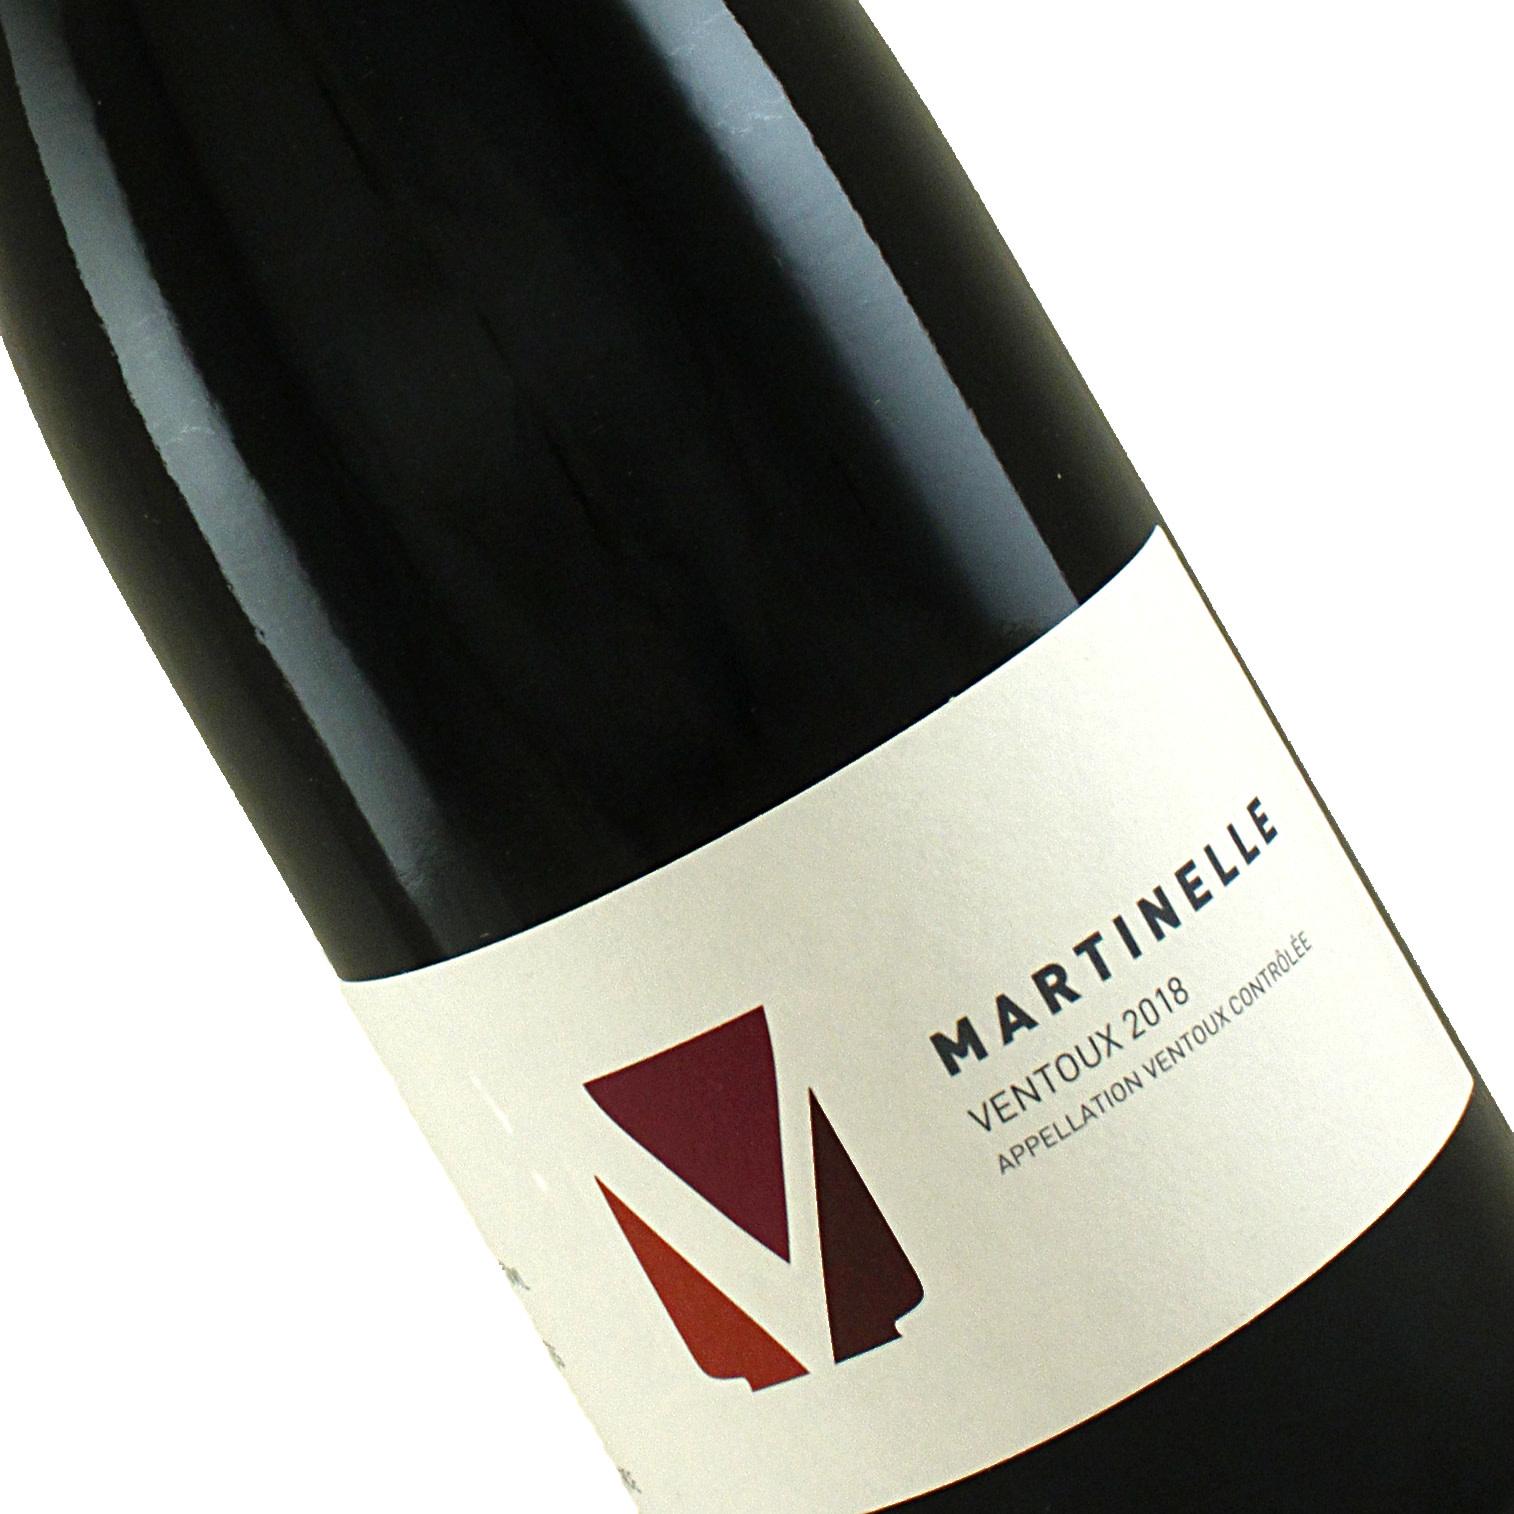 Martinelle 2018 Ventoux Rouge, Rhone